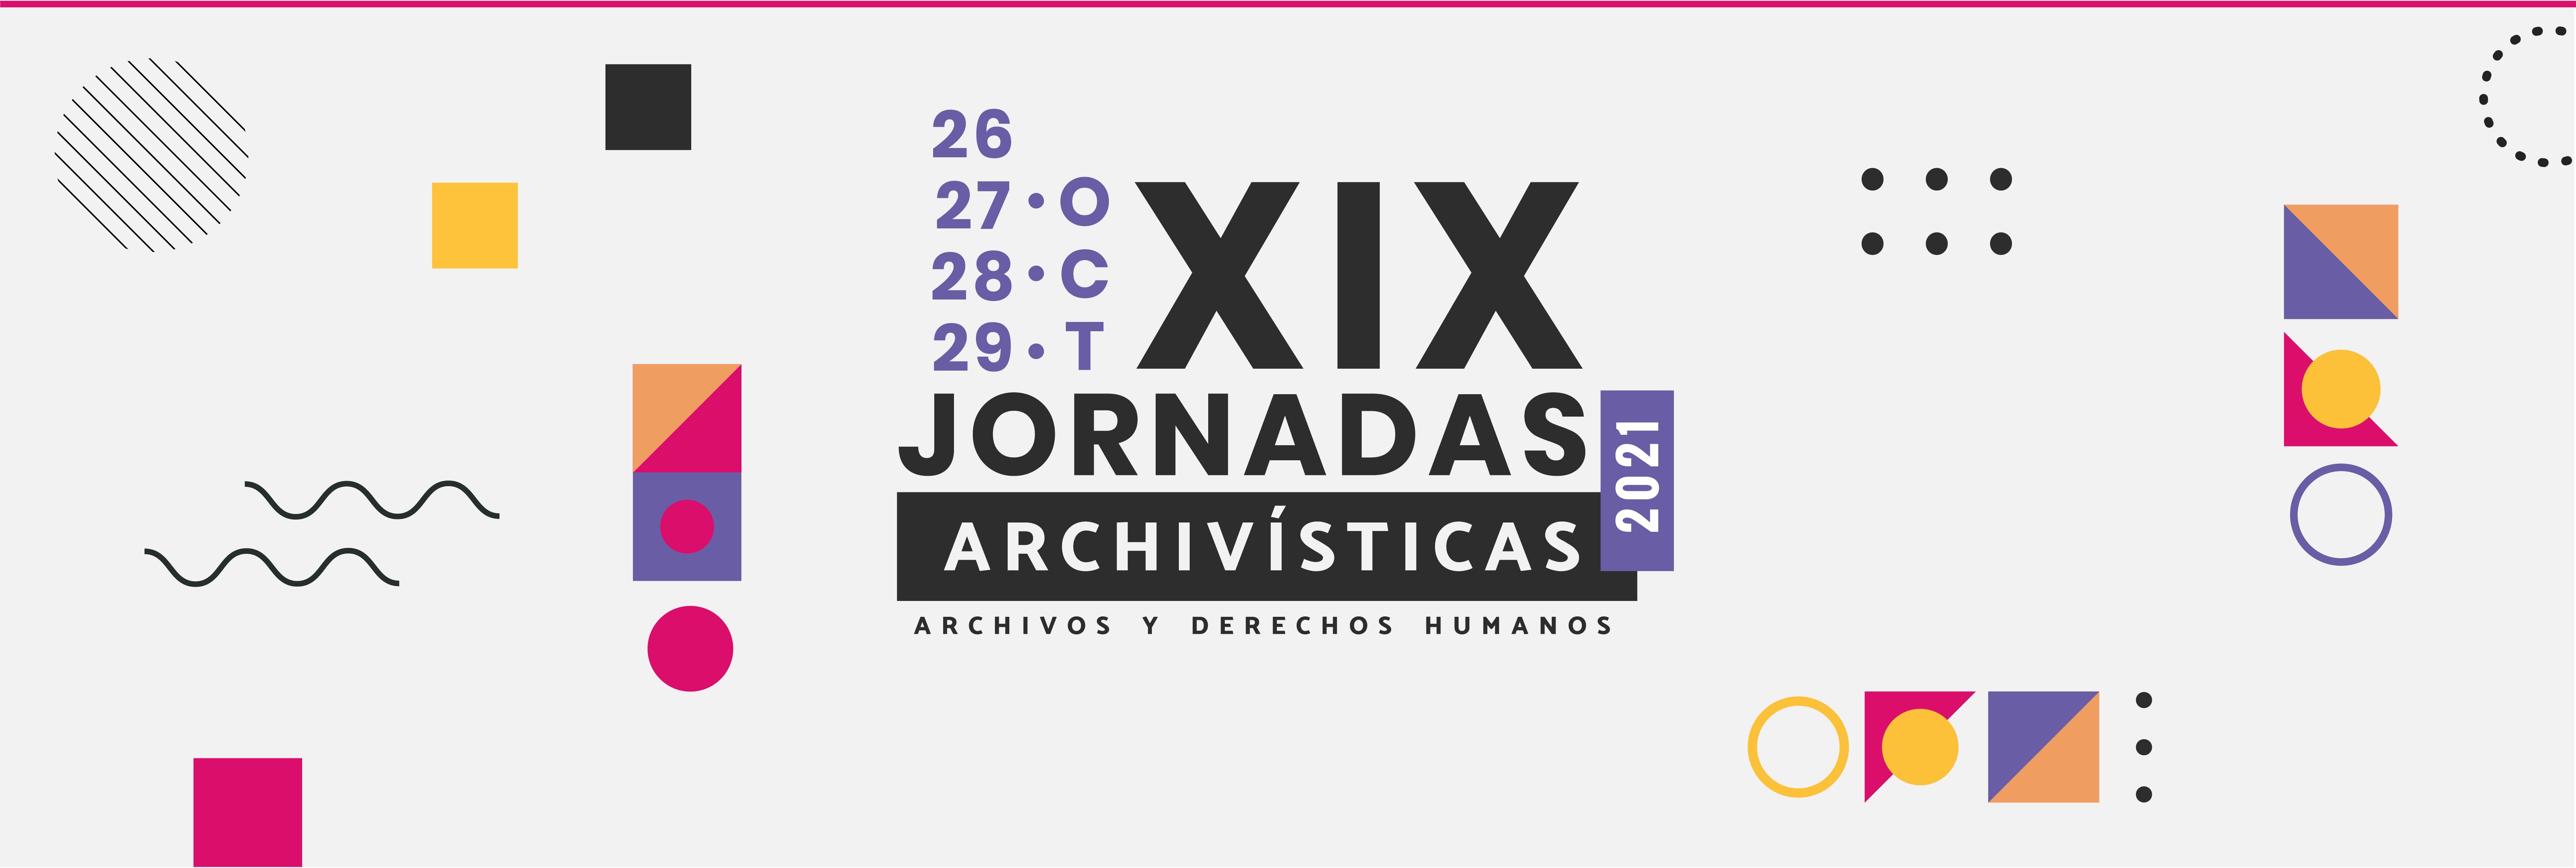 Slideshow Jornadas Archivísticas